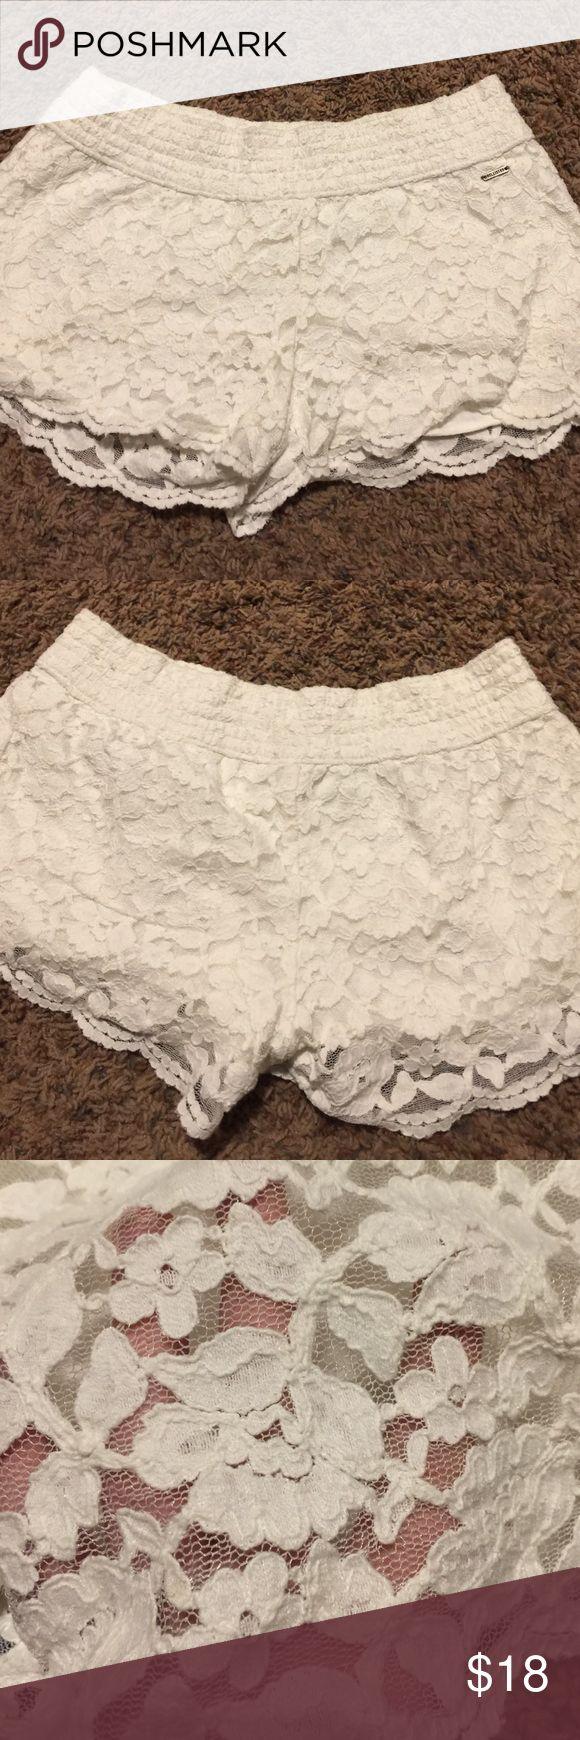 white lace shorts Hollister white laced shorts. size M. barely worn. Hollister Shorts